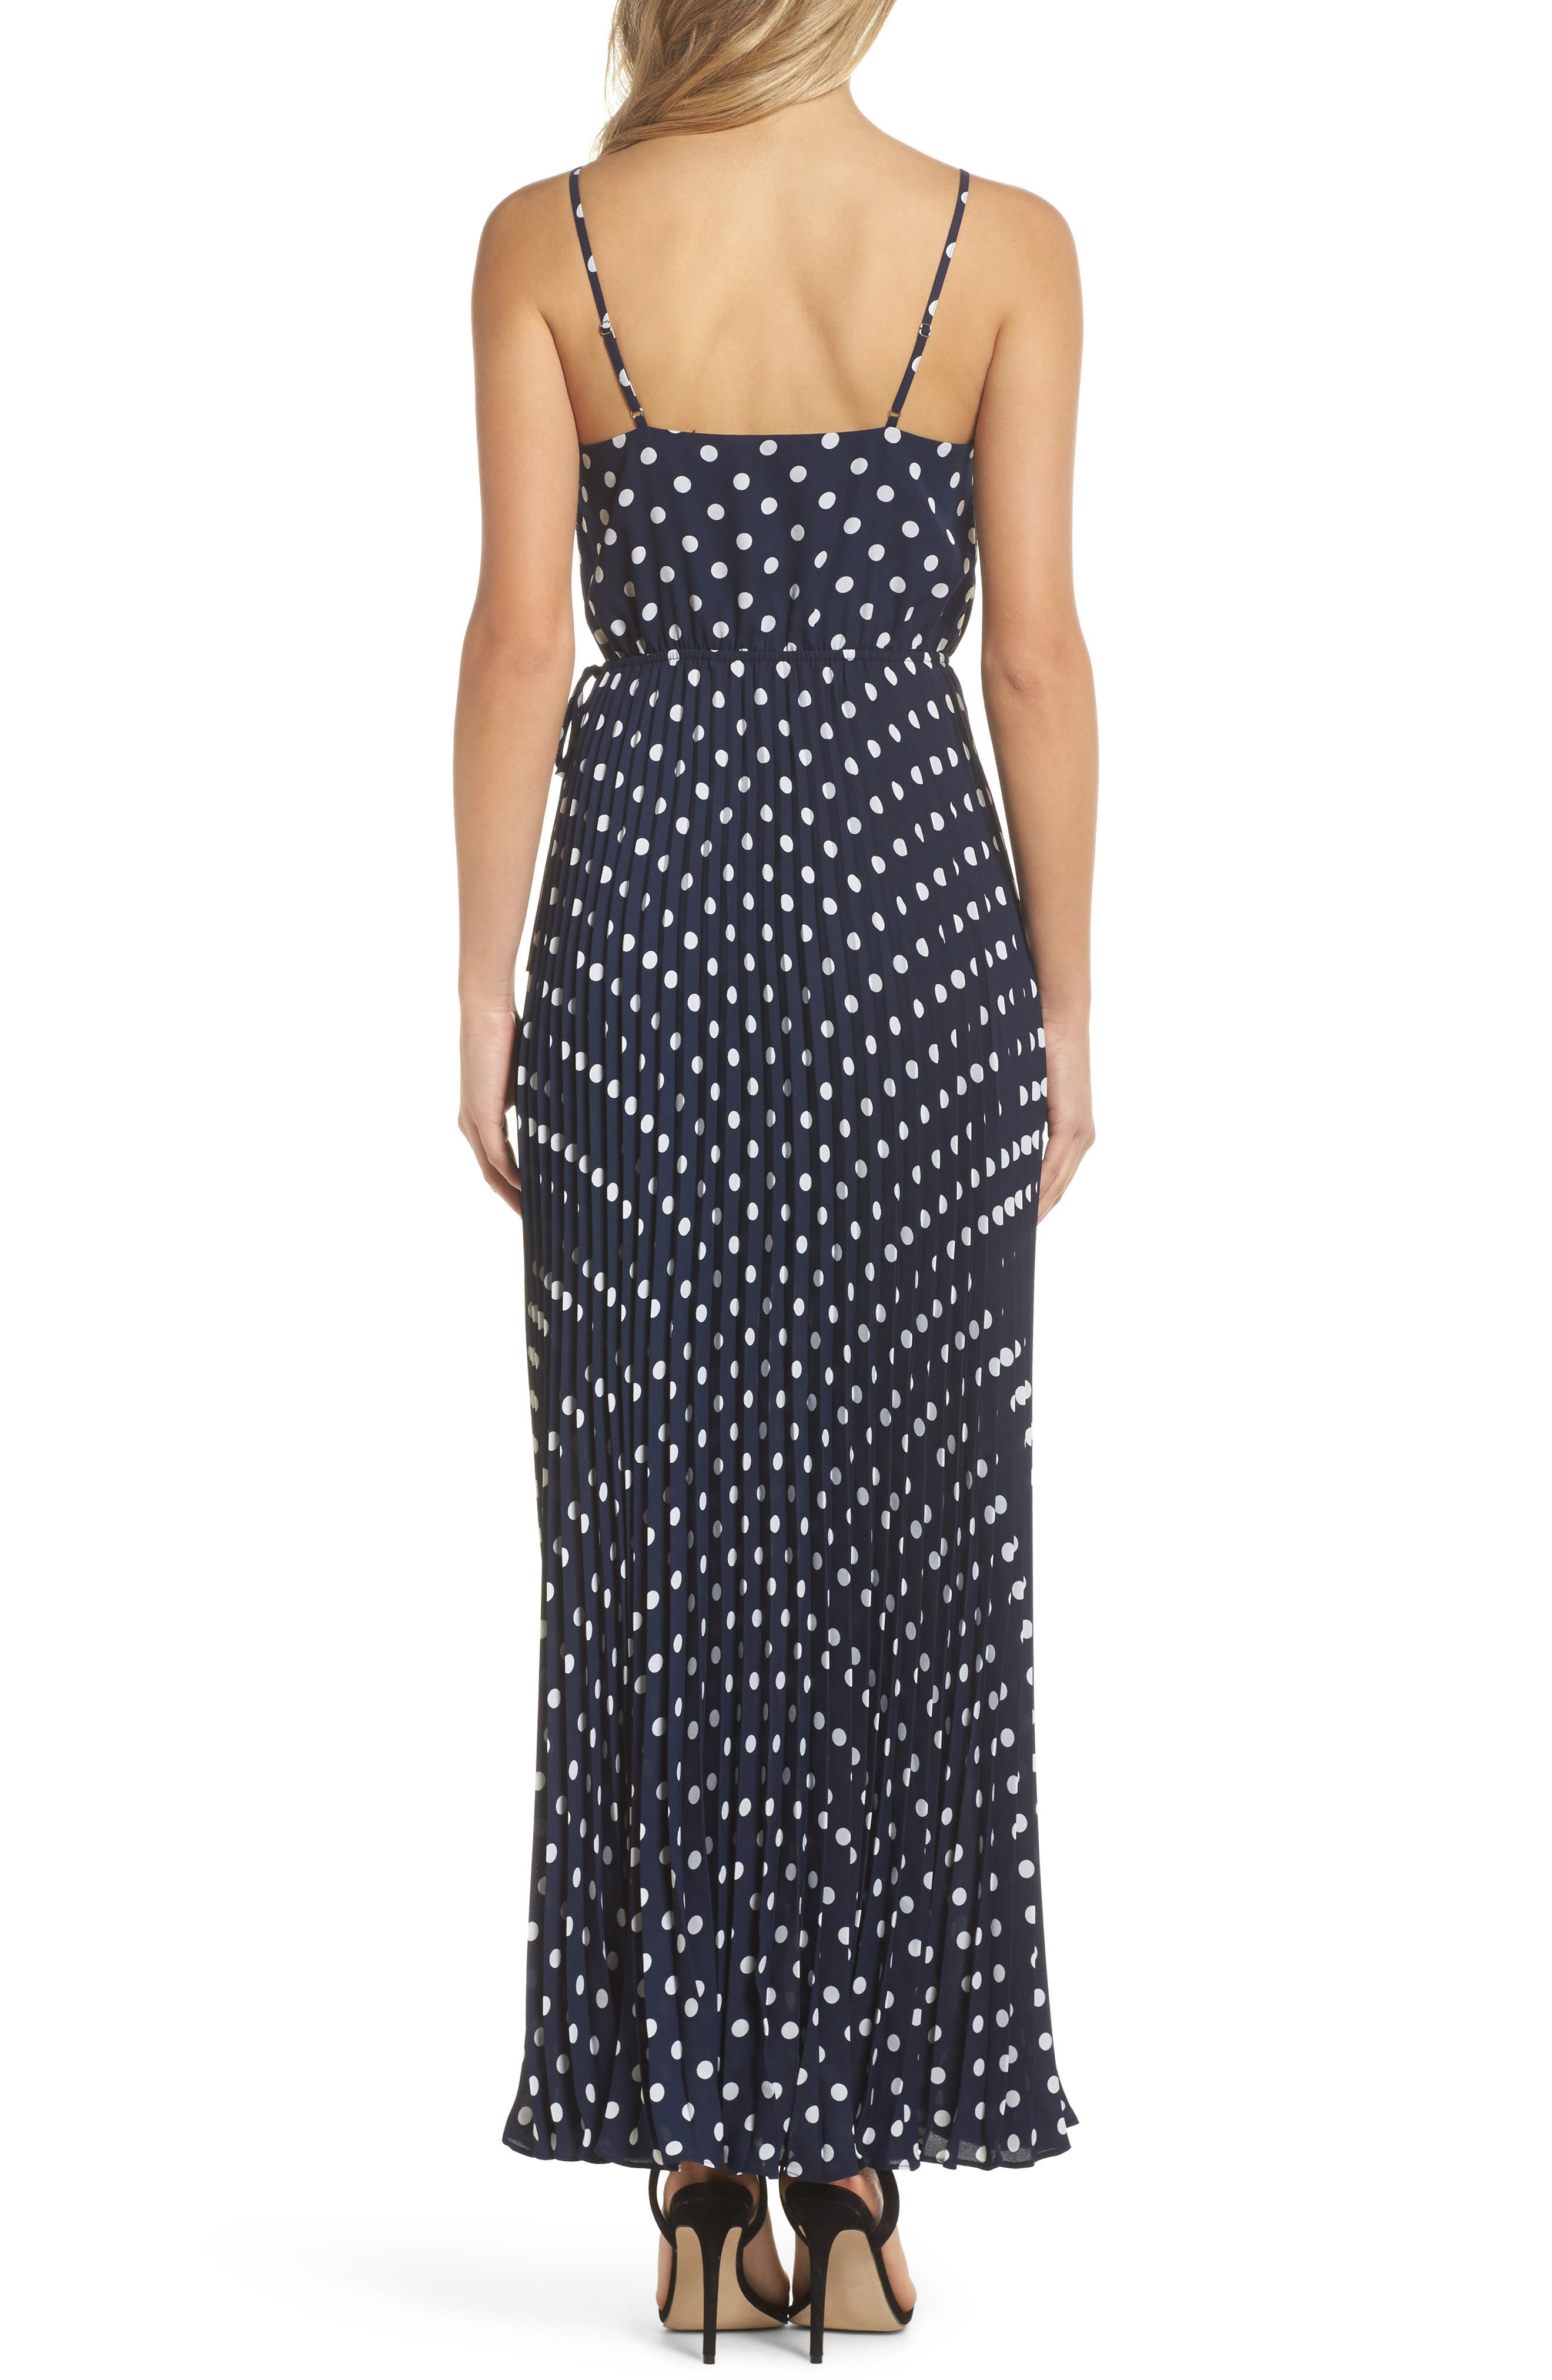 Lily Pond Maxi Dress,                             Alternate thumbnail 3, color,                             Navy Polka Dot